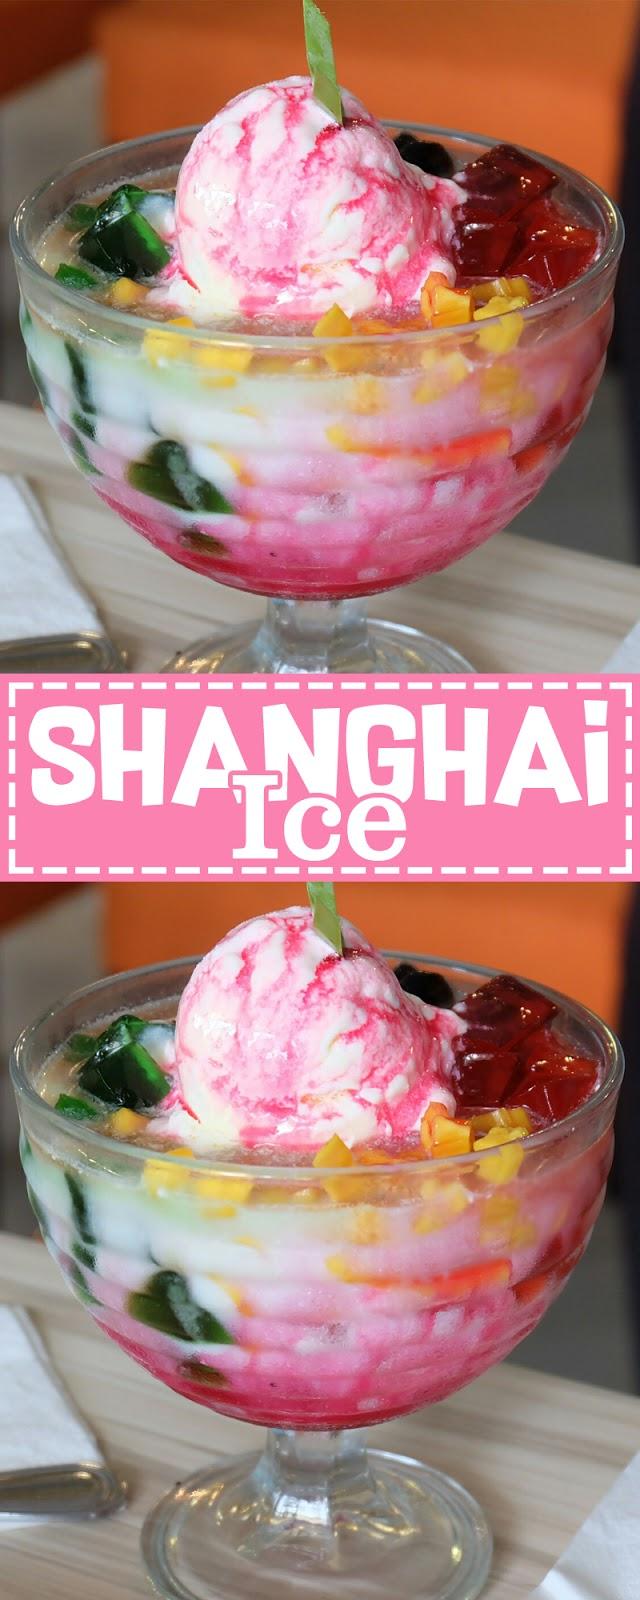 SHANGHAI ICE